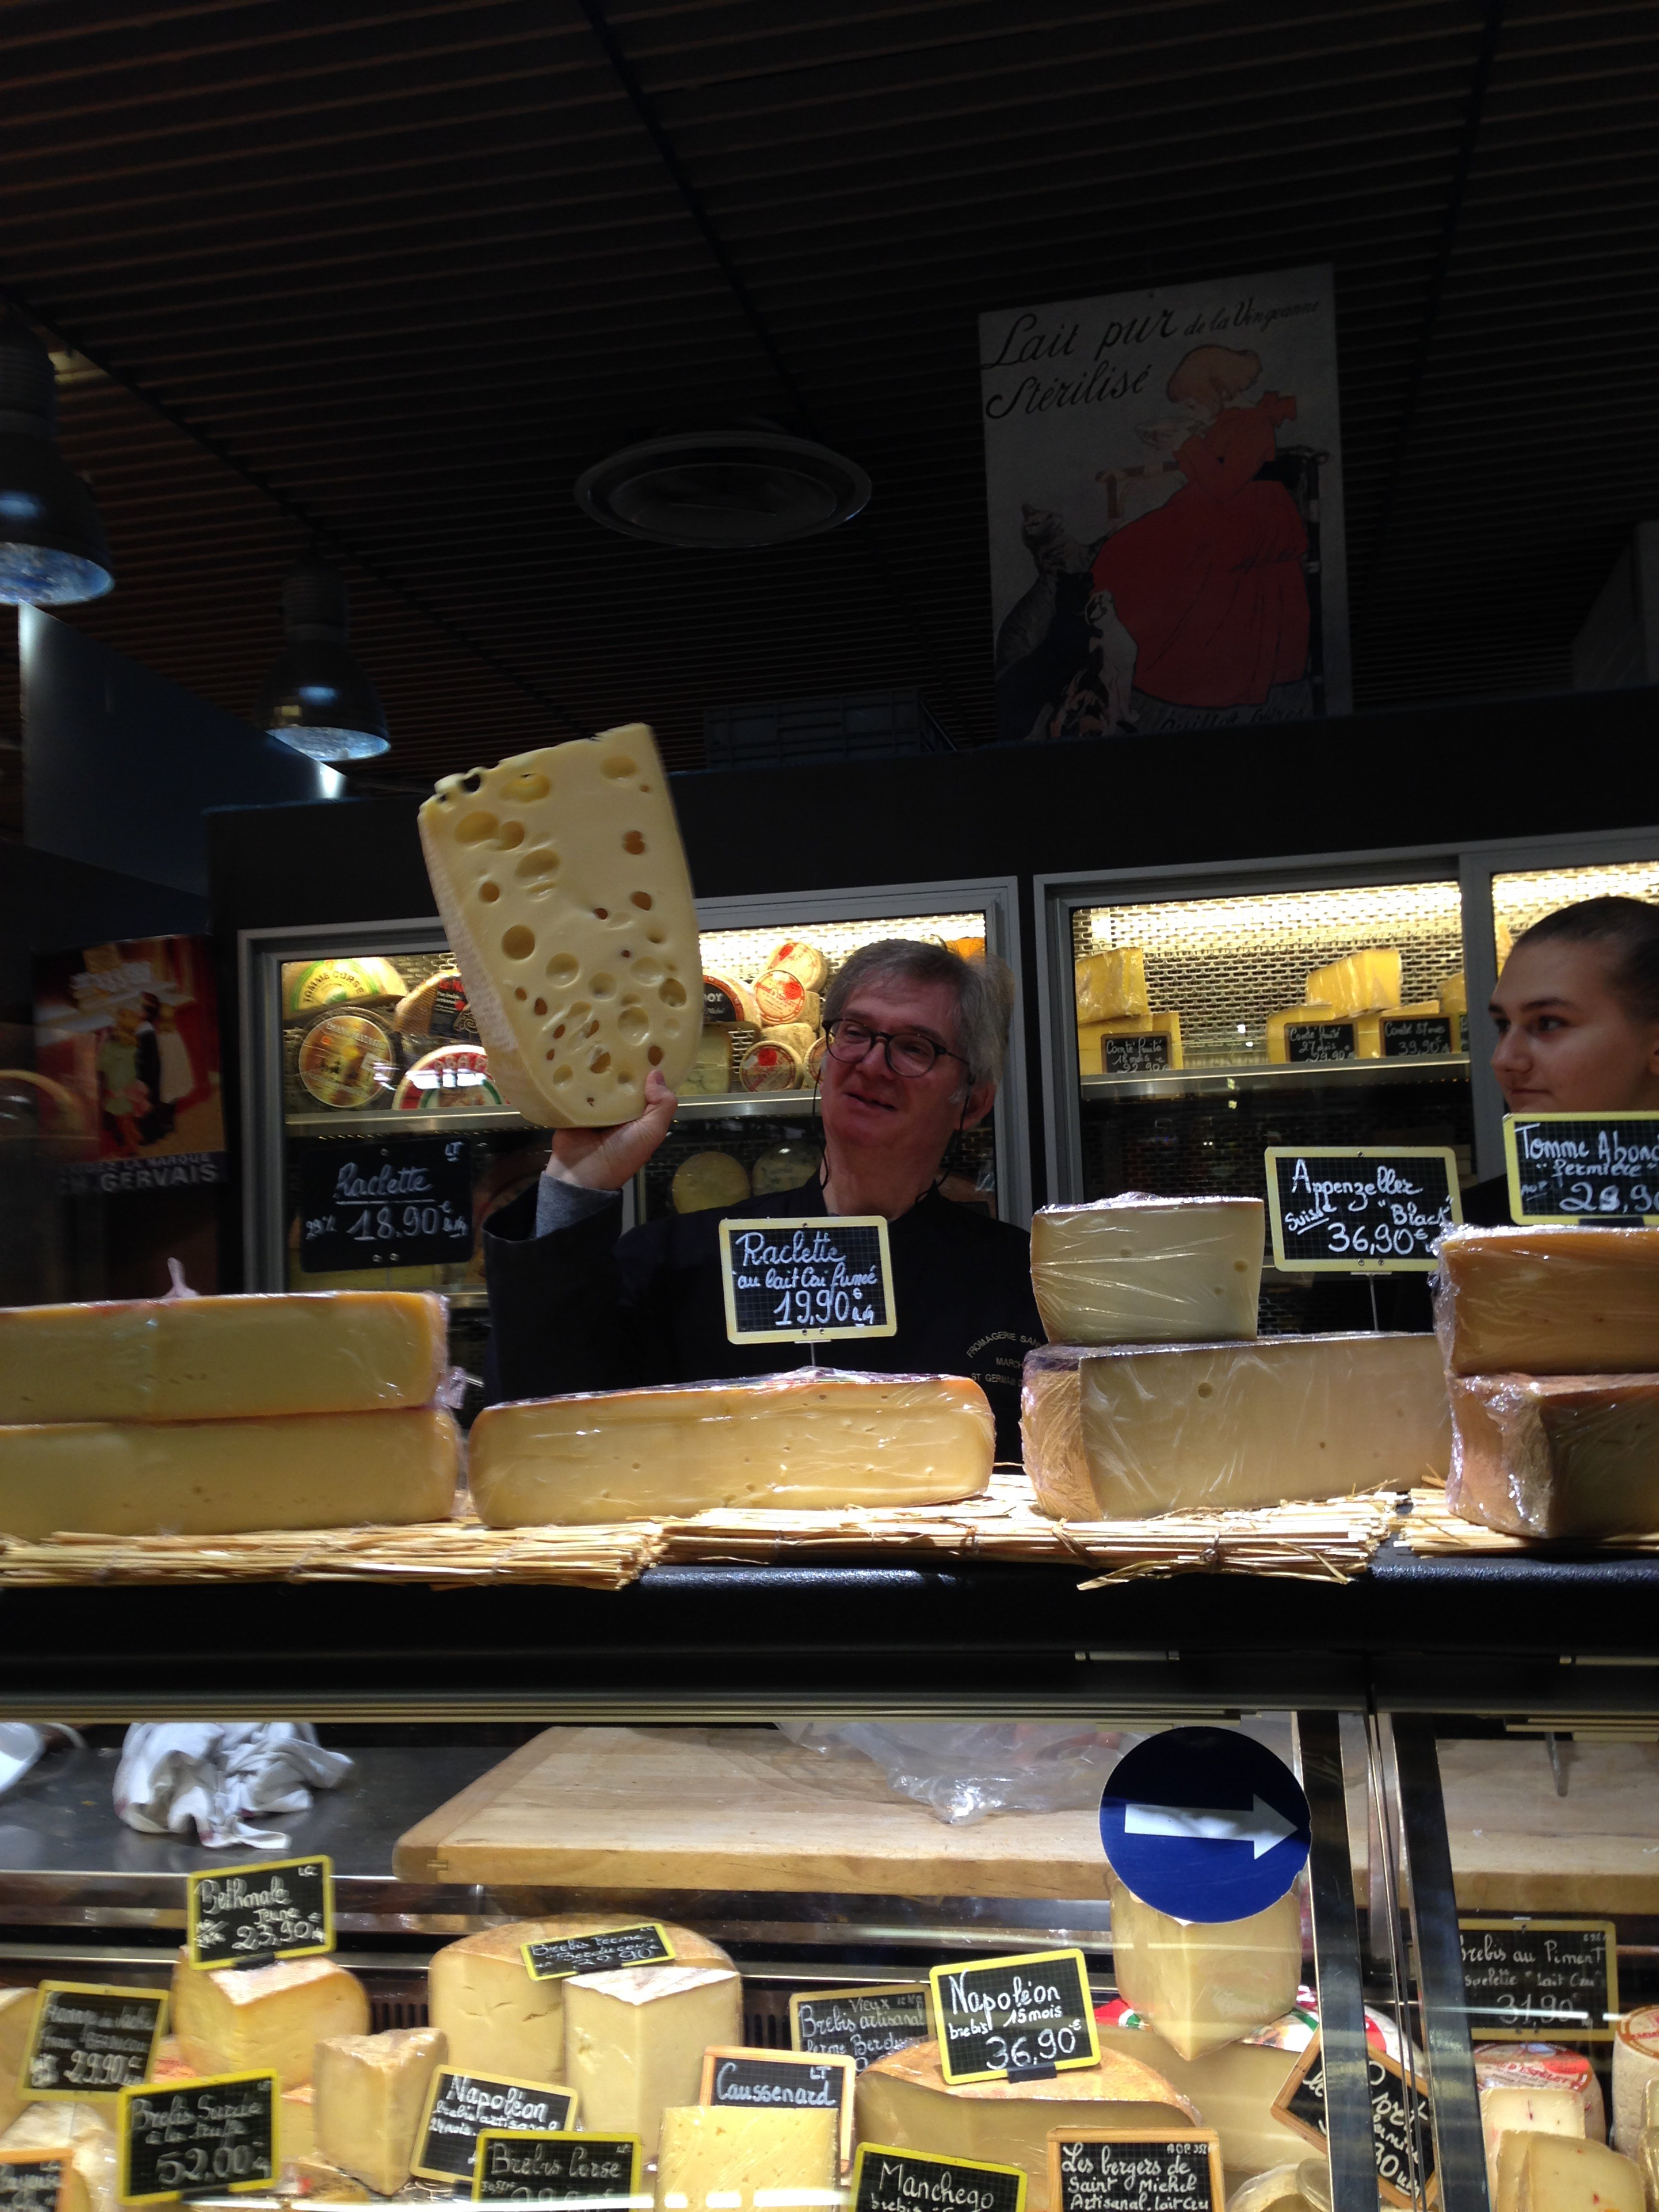 Cheese in St. Germain Market Paris